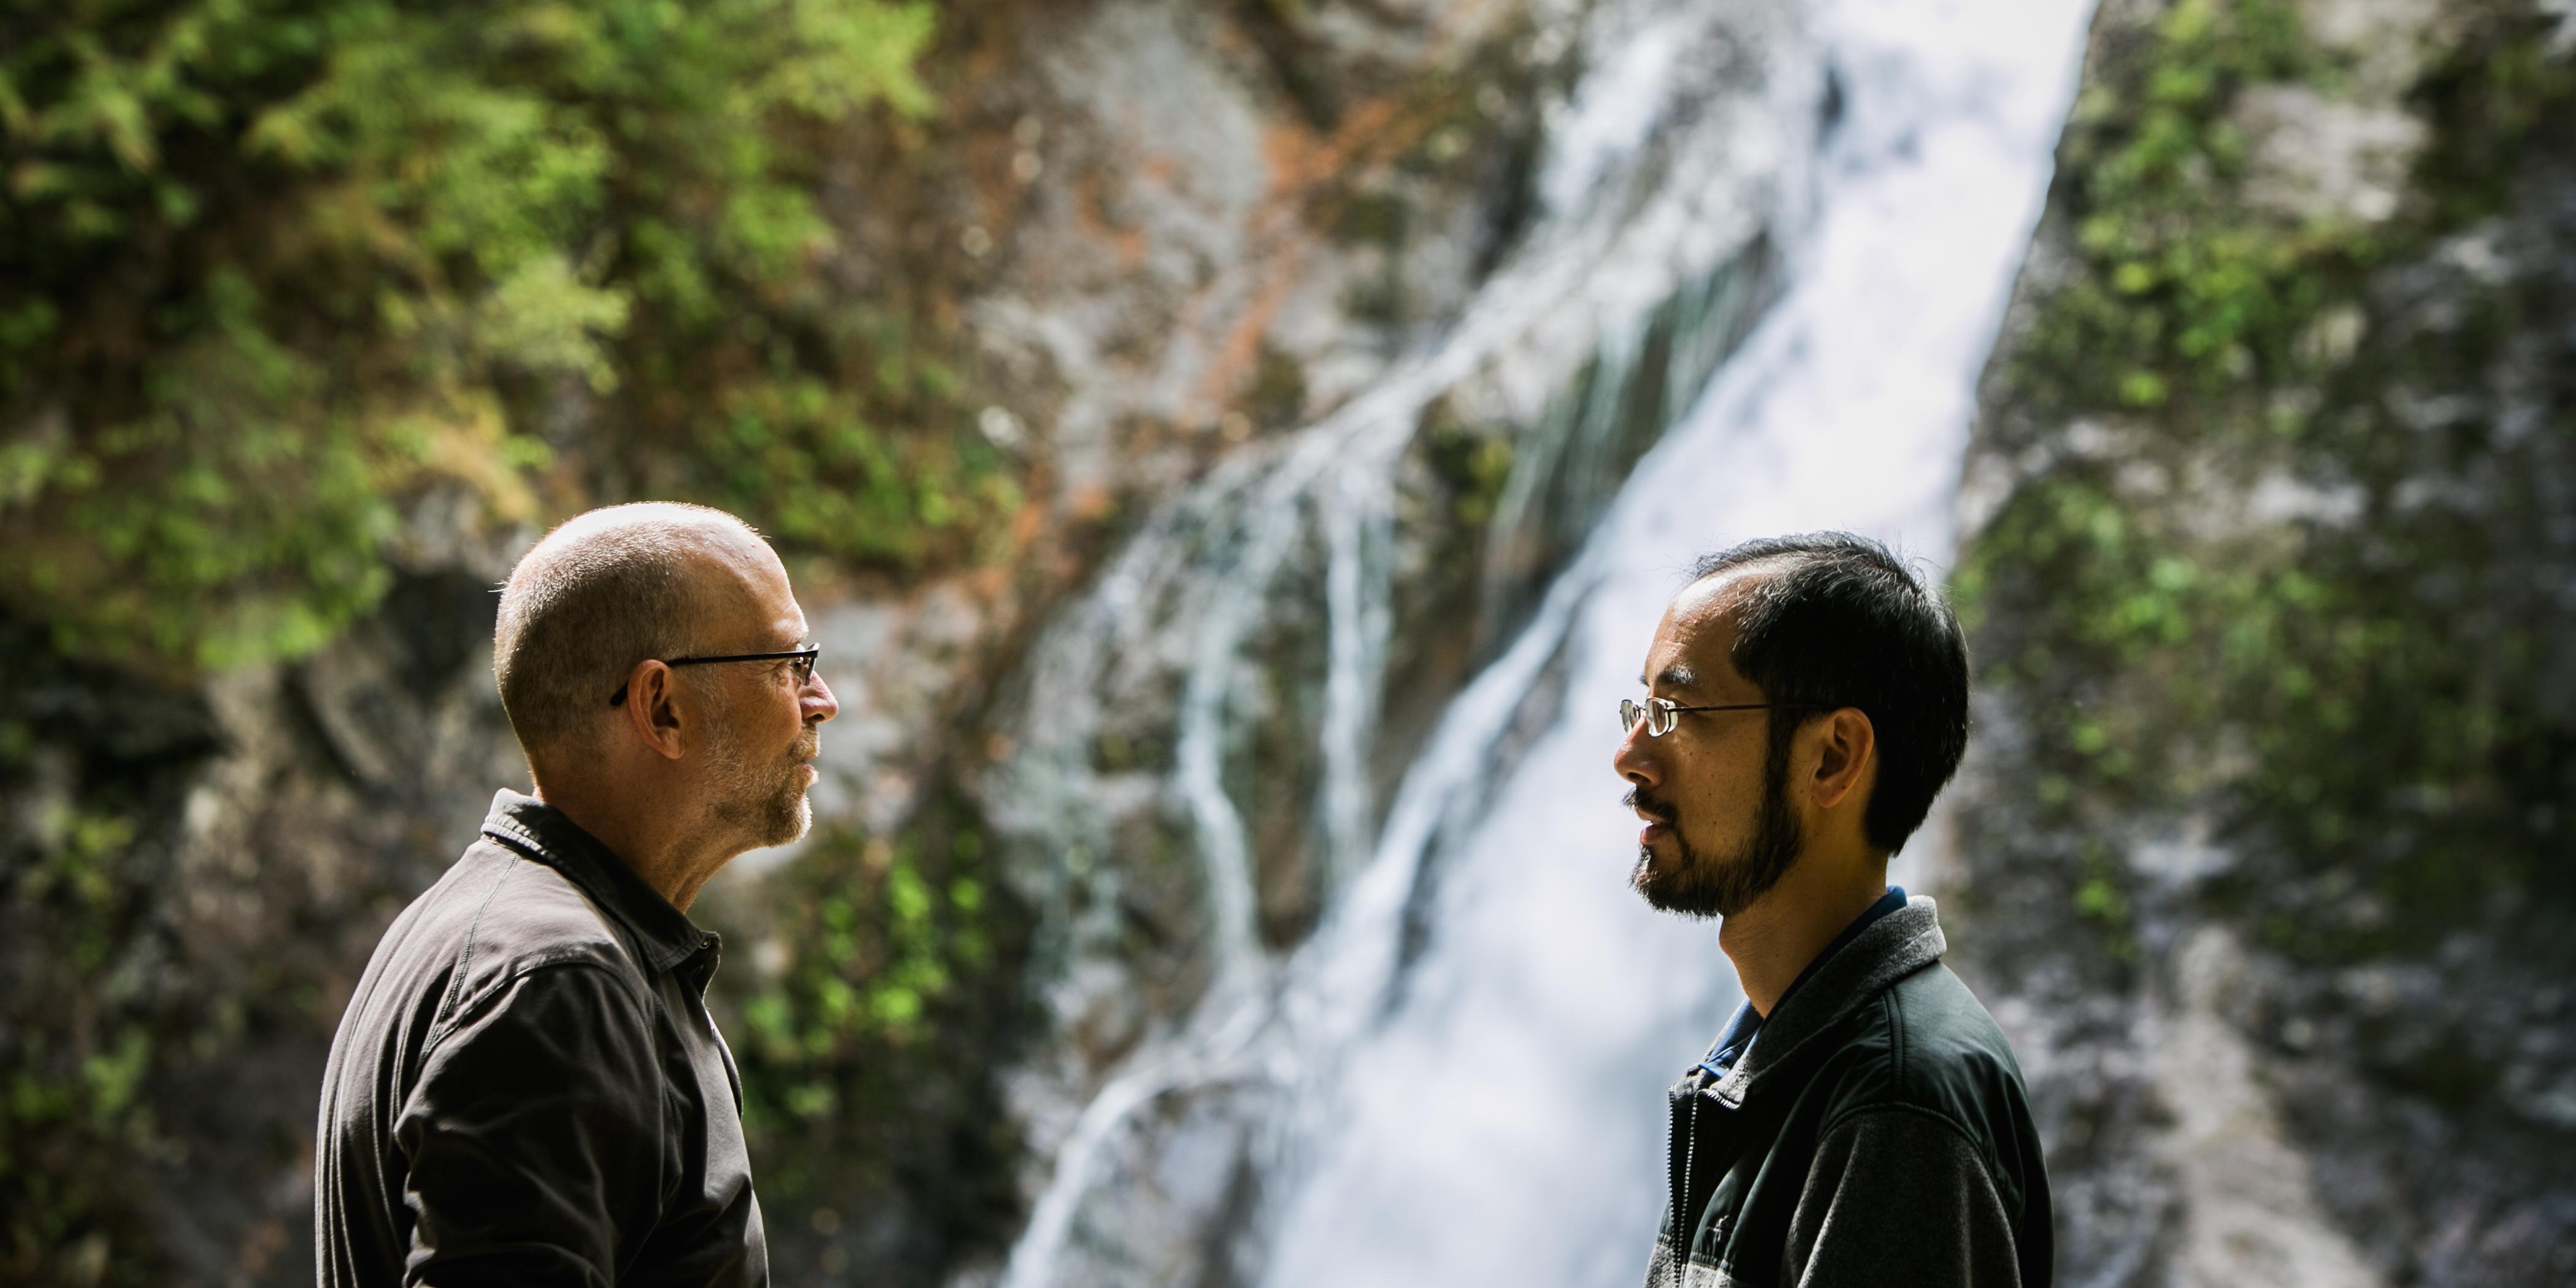 Climate change is darkening Seattle's water forecast